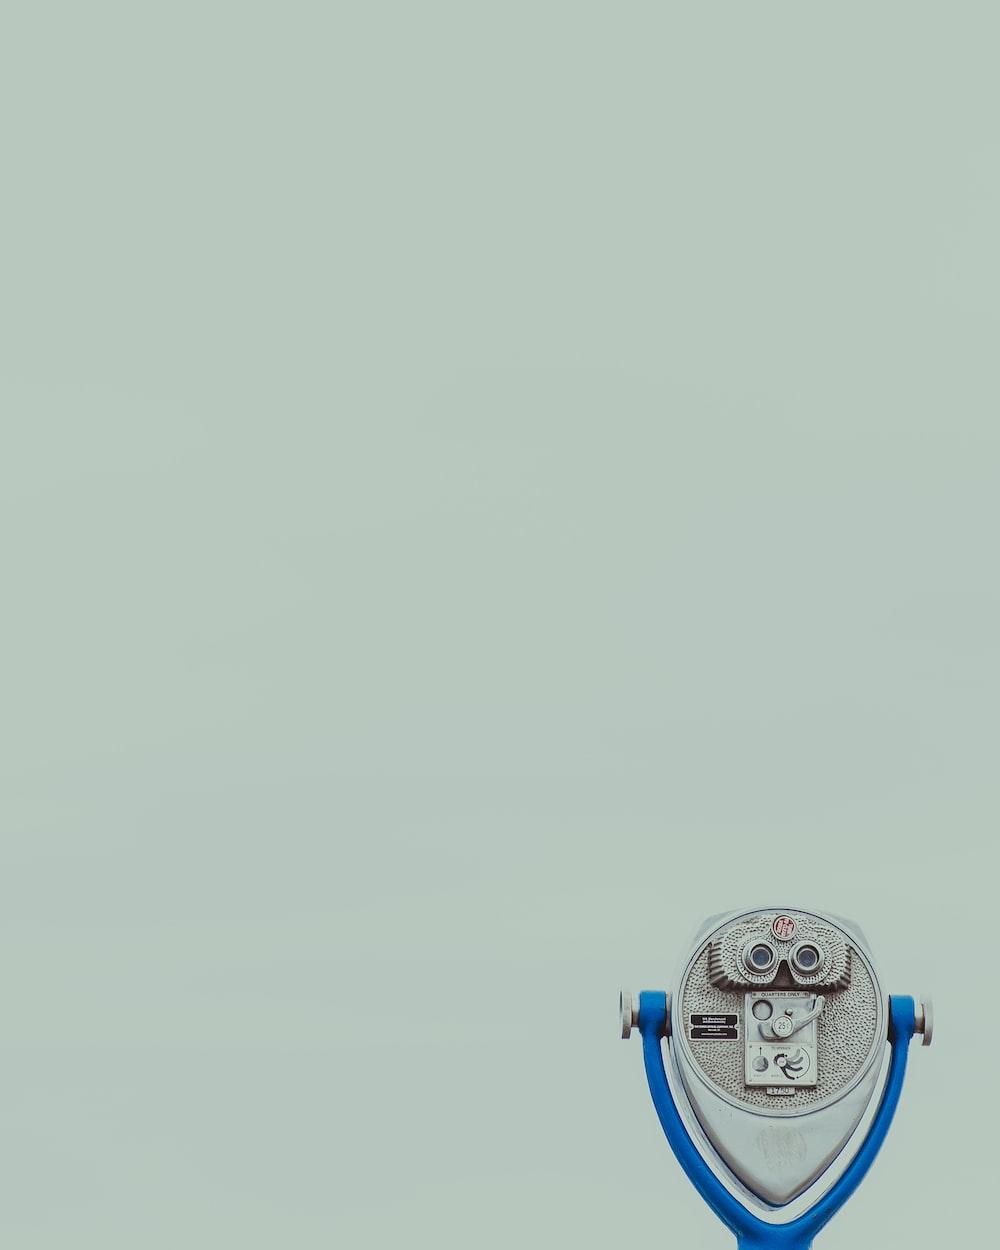 blue and gray metal binoculars